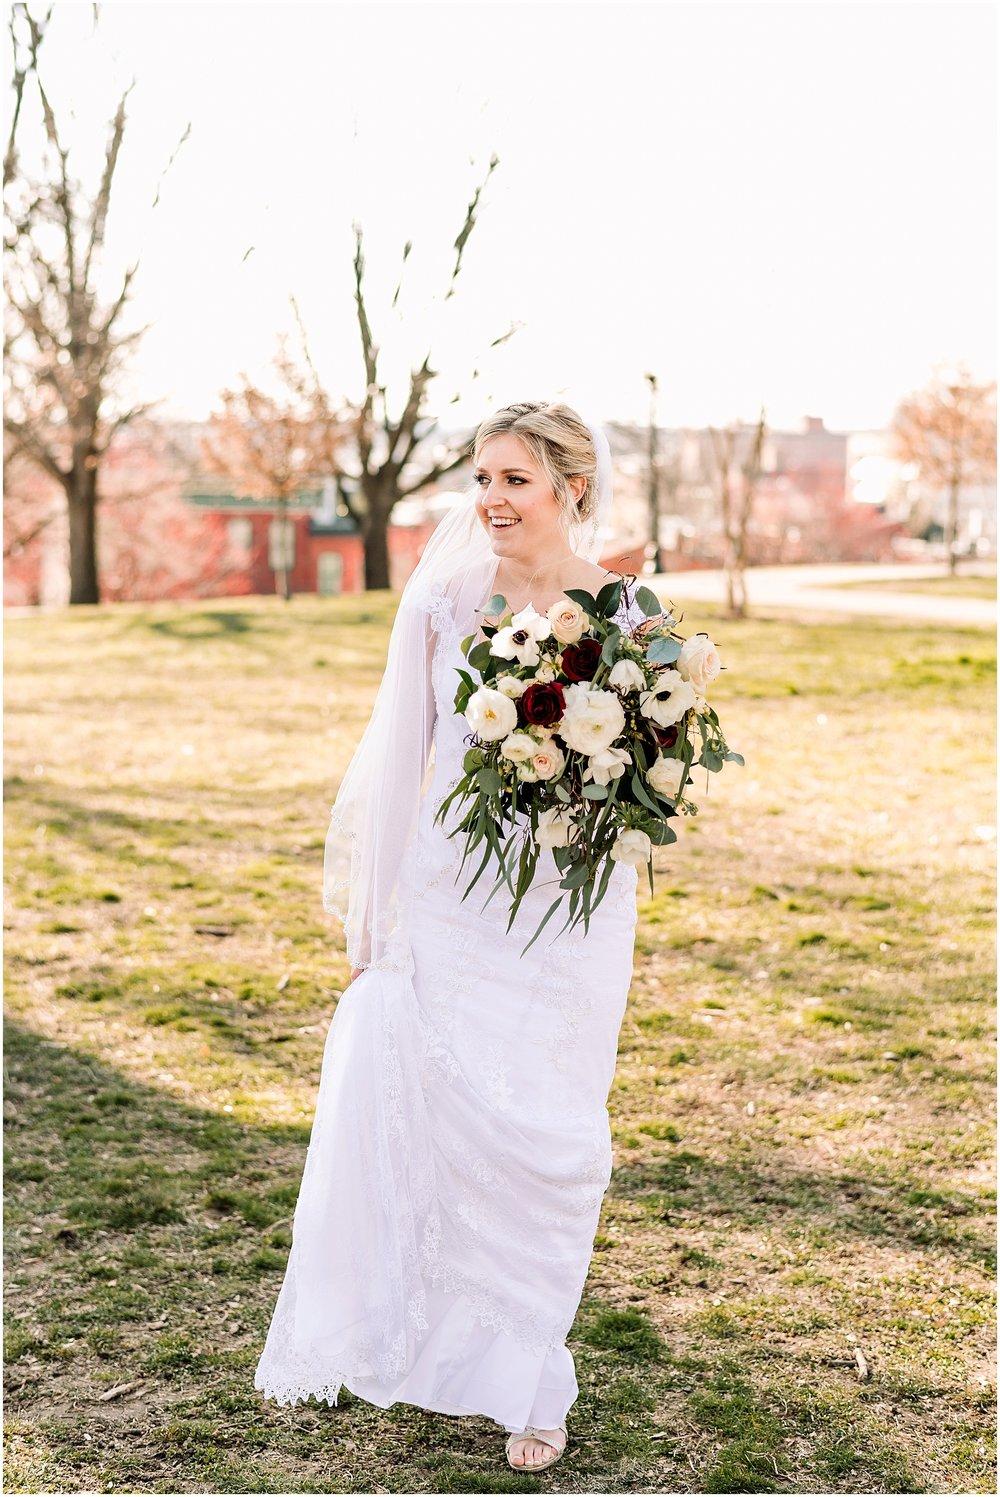 Hannah Leigh Photography Belvedere Wedding Baltimore MD_7238.jpg